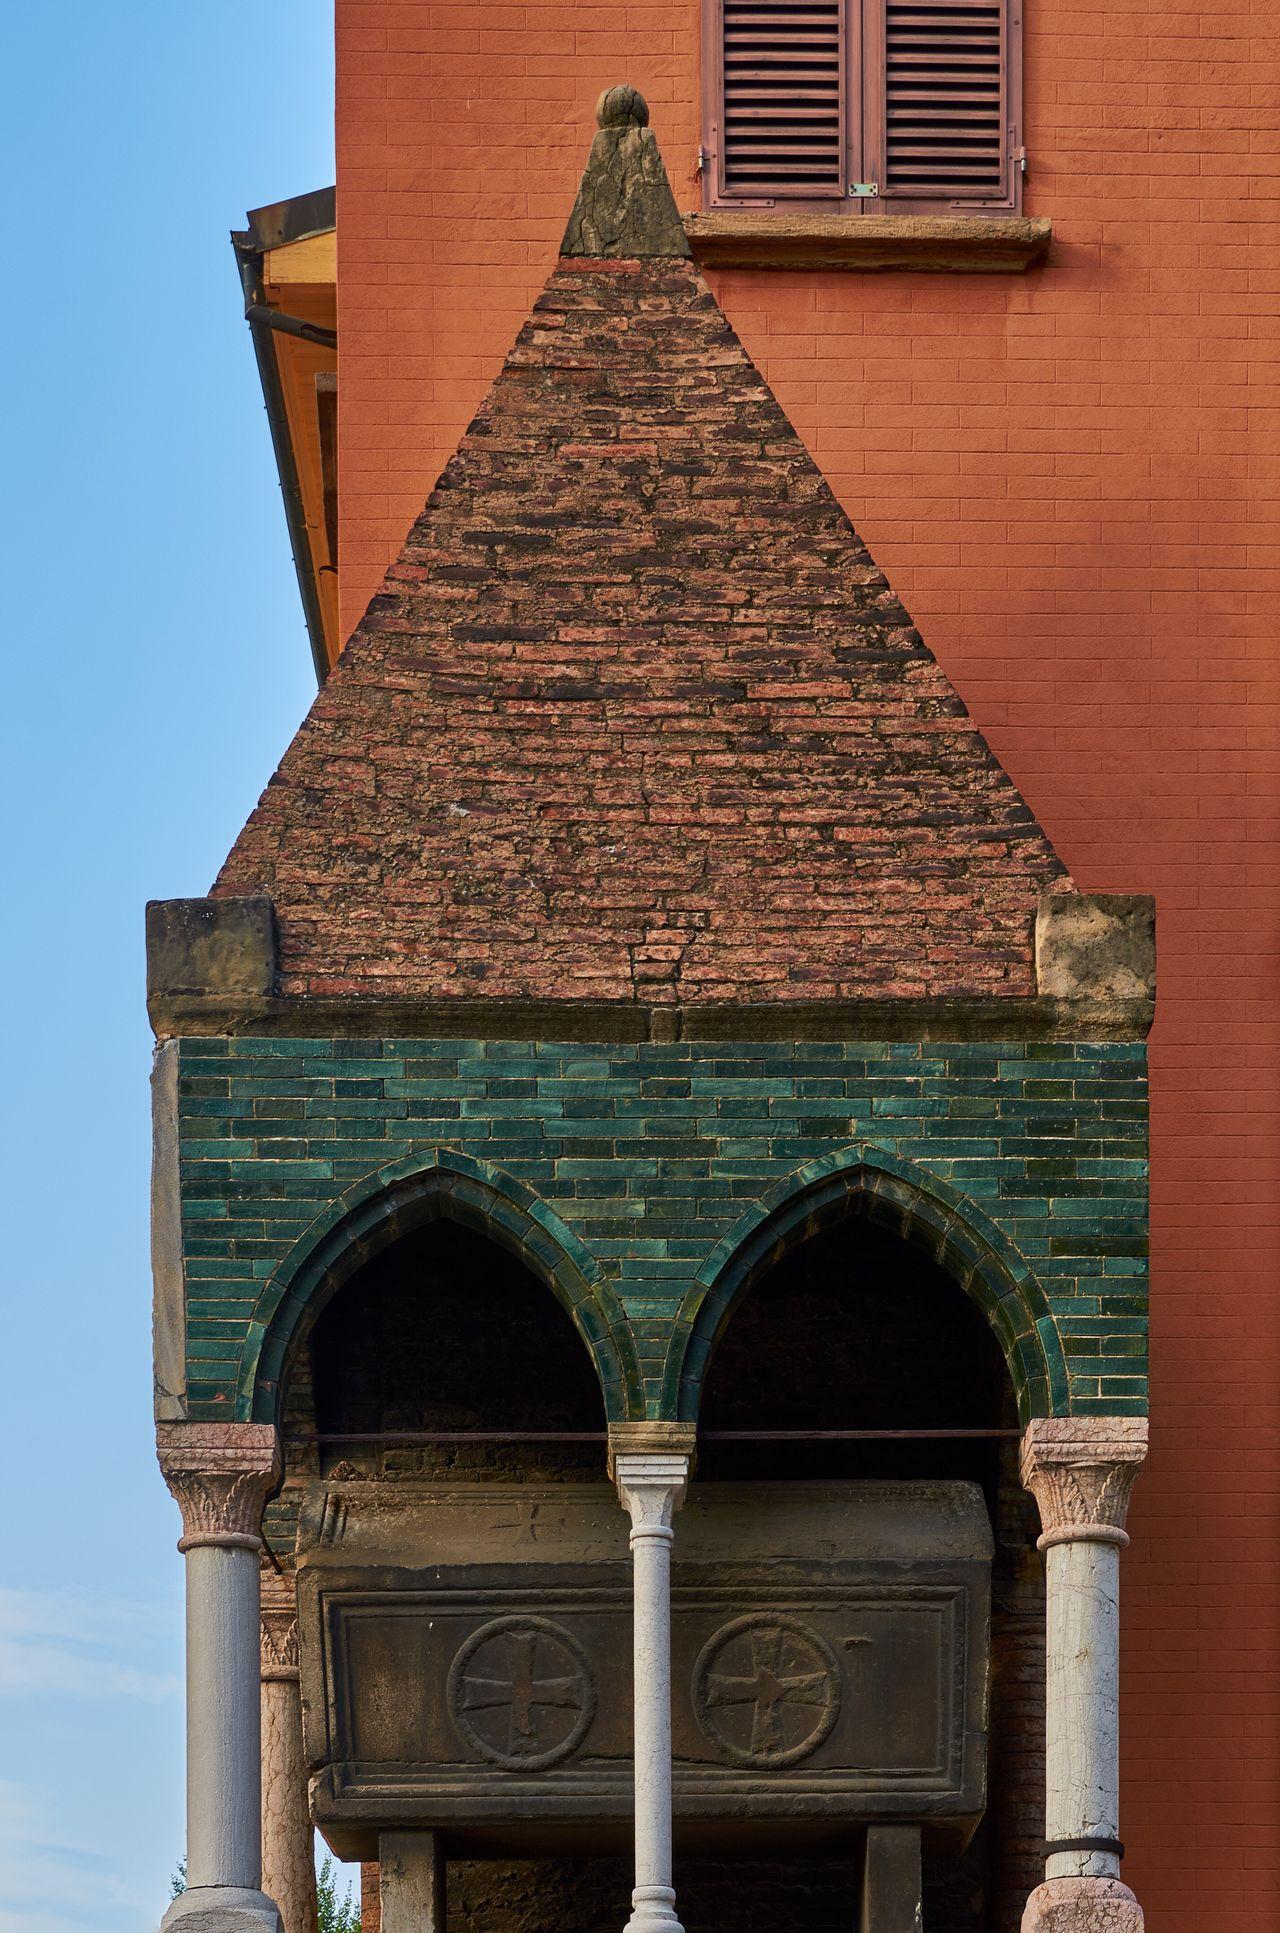 Ark of Egidio Foscherai, Piazza San Domenico, Bologna Bologna Italy Piazza San Domenico Historic Architecture Landmark Monument Blue Sky Built Structure No People Medieval Medieval Architecture Tiles Texture Bricks Tomb